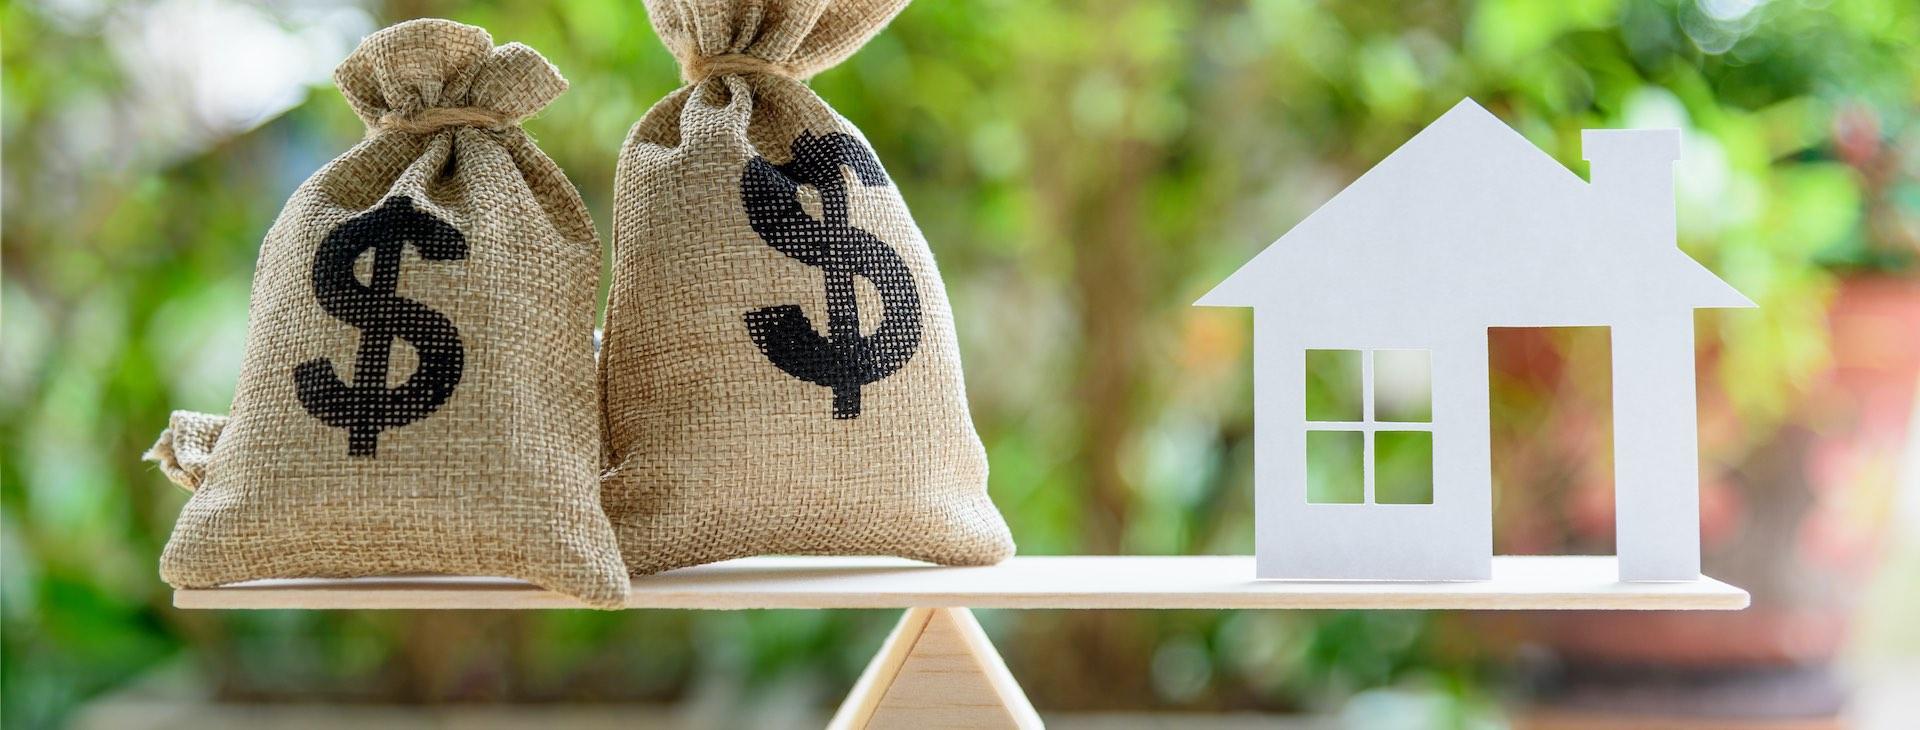 Immobilienmakler Lilienthal Bremen – UC Immobilien – Preisbestimmung – UC Immobilien